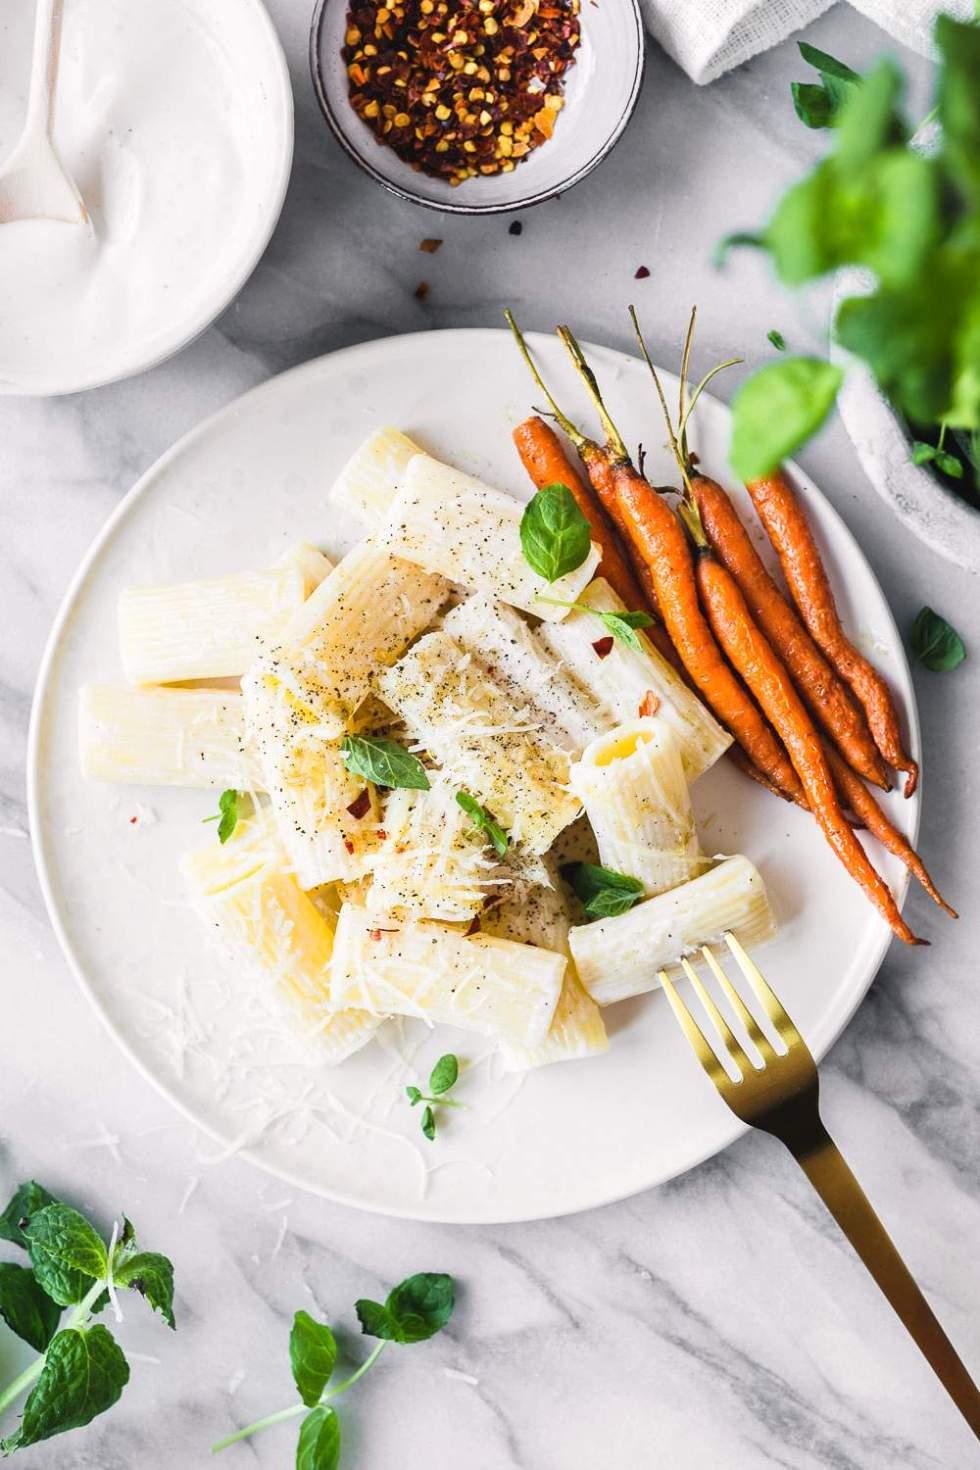 Vegan spring pasta with roasted carrots and yogurt sauce